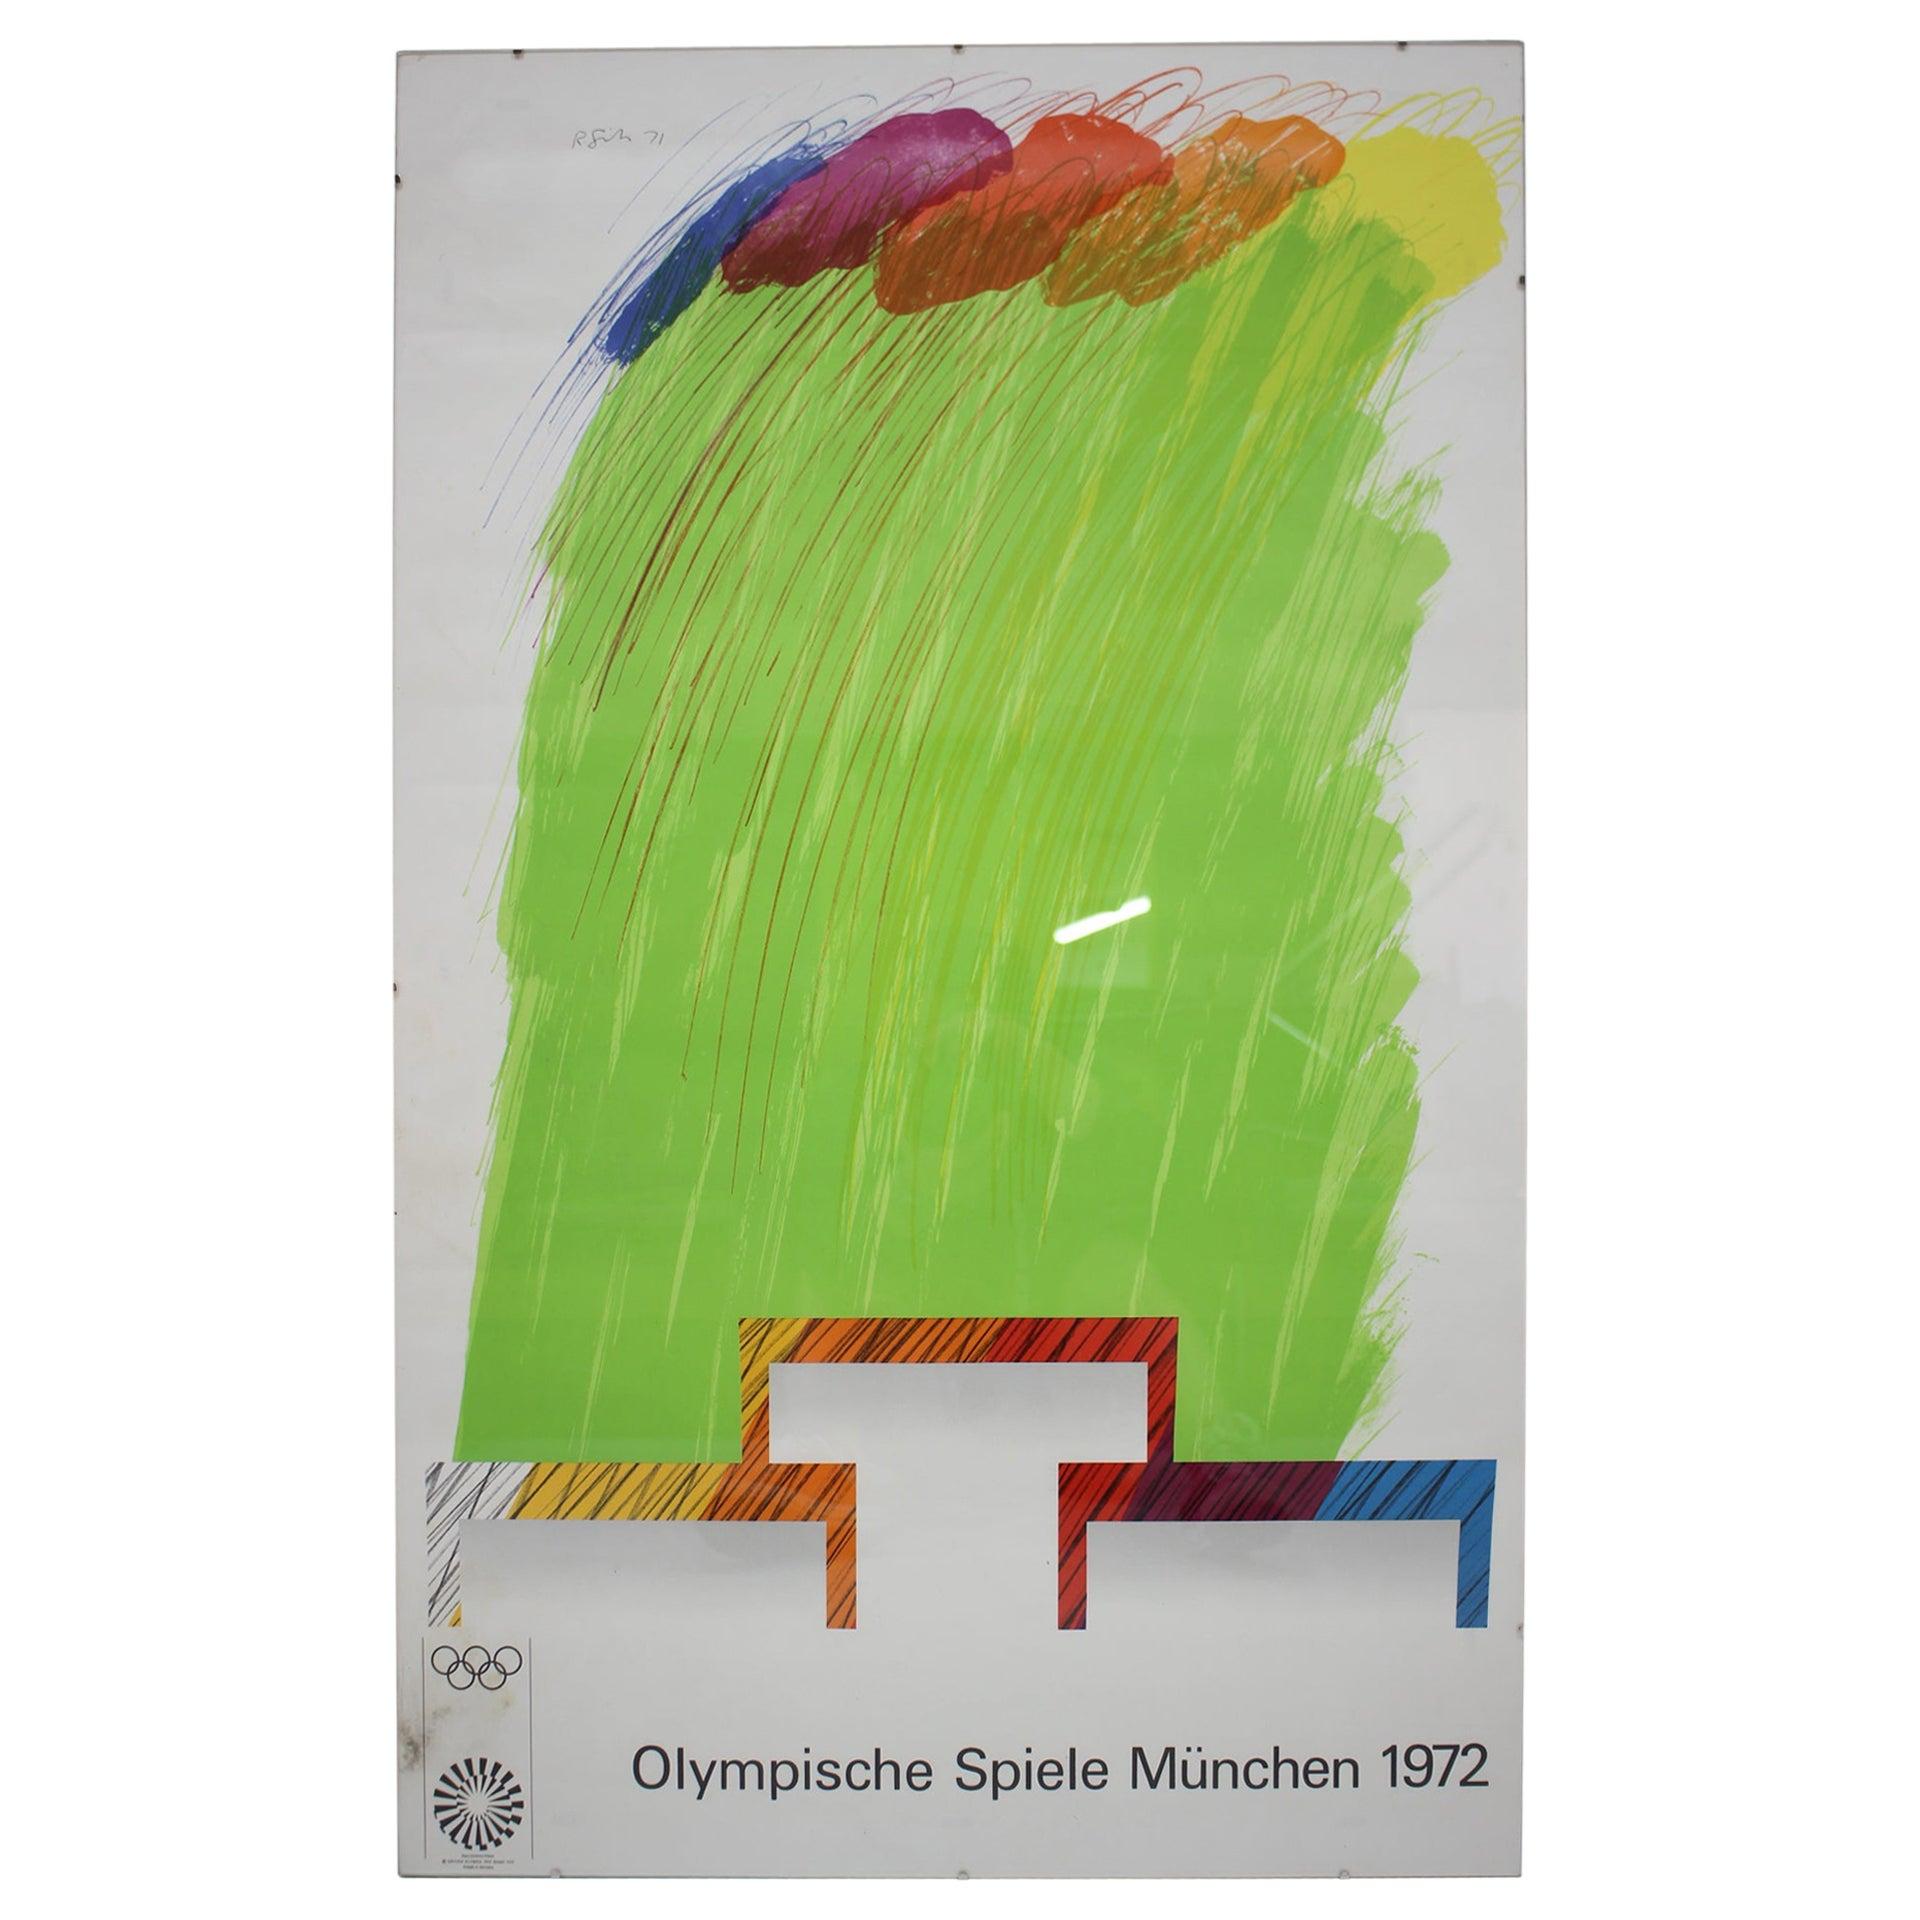 Olympic Games Munich 1972 Poster / Olympische Spiele München, by Richard Smith